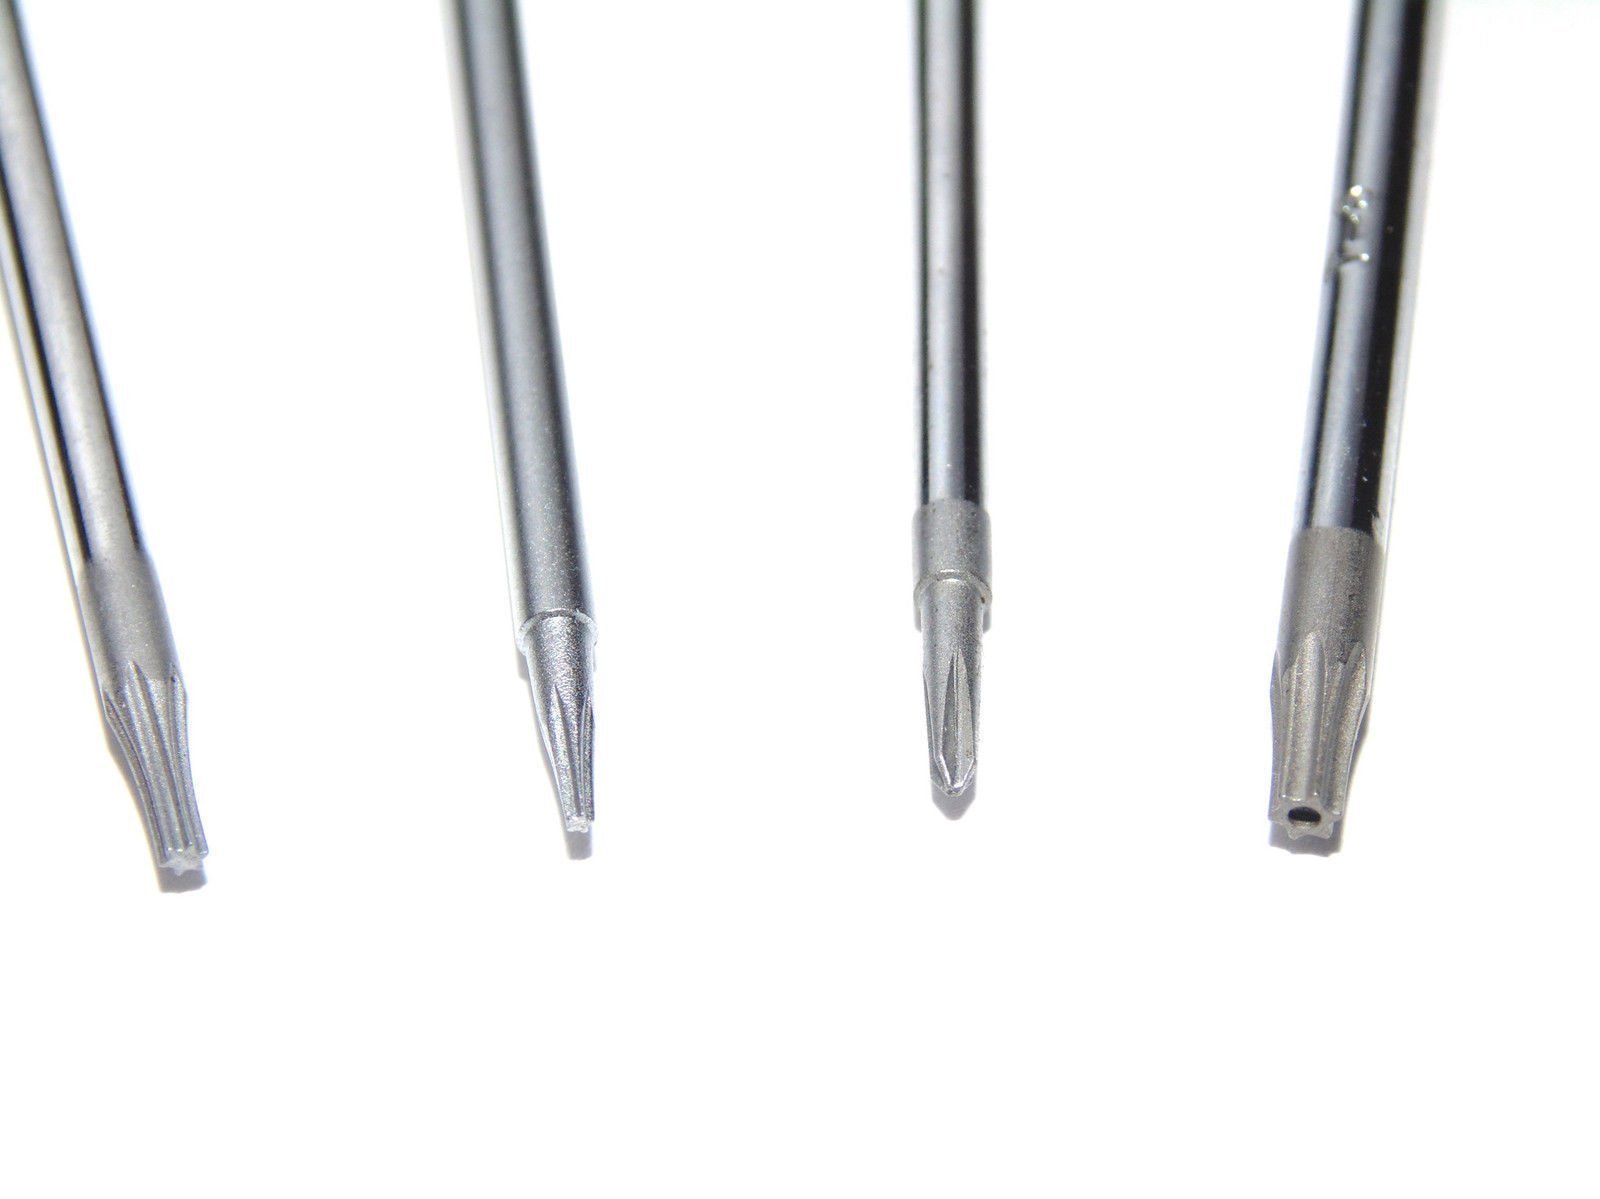 Generic US150606-38 {8%0442?1} obe Pry'' Screwdriv Repair Kit Torx T8 Fix Macbook Air T5 Phillips 11'' 13'' Screwdriver Pentalobe Pry Fix Macbook A